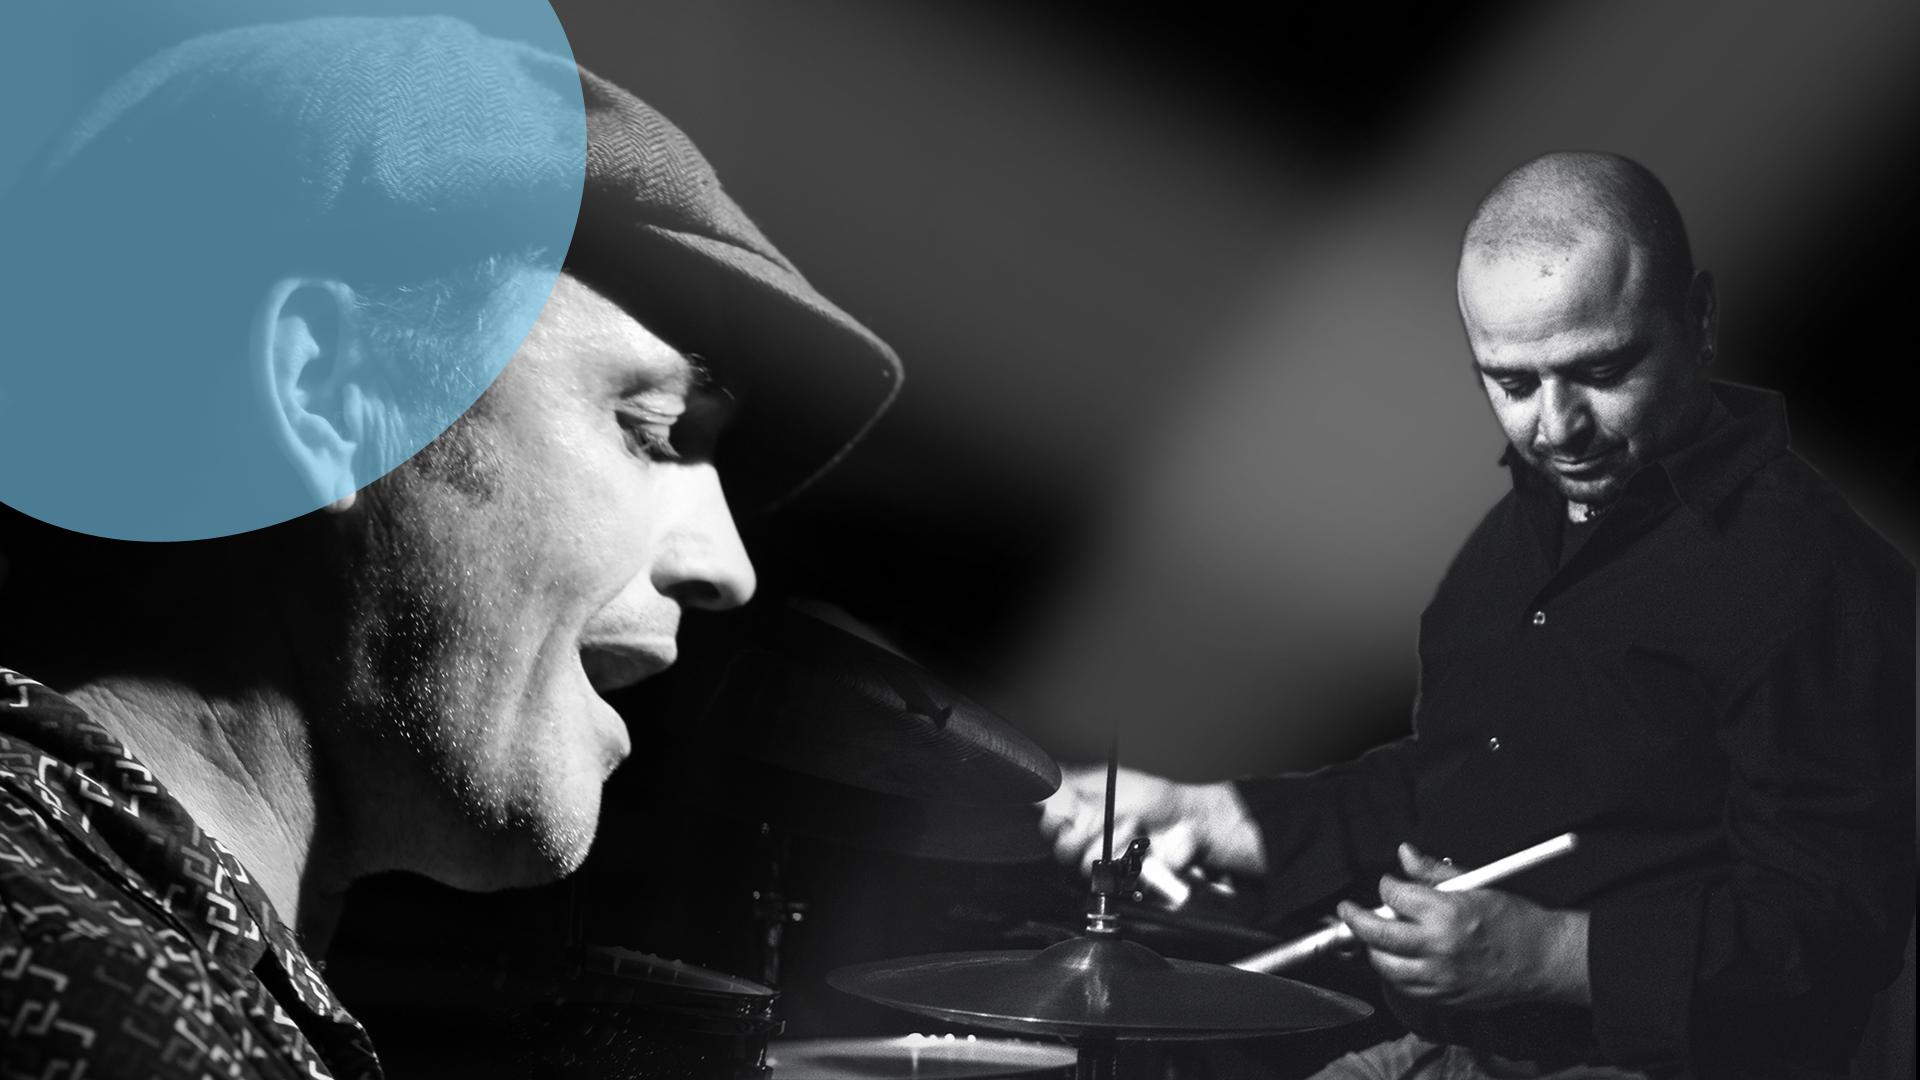 18.08.18 :: BONN | Astatine:: YASSMO' featuring ANTONIO FUSCO, DANH THAI & IGOR LAZAREV